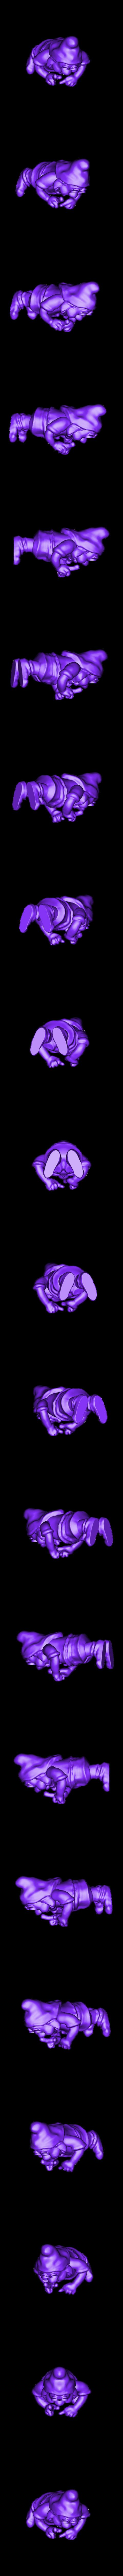 doc.stl Download free STL file Dwarfs - Doc • 3D printing model, quangdo1700